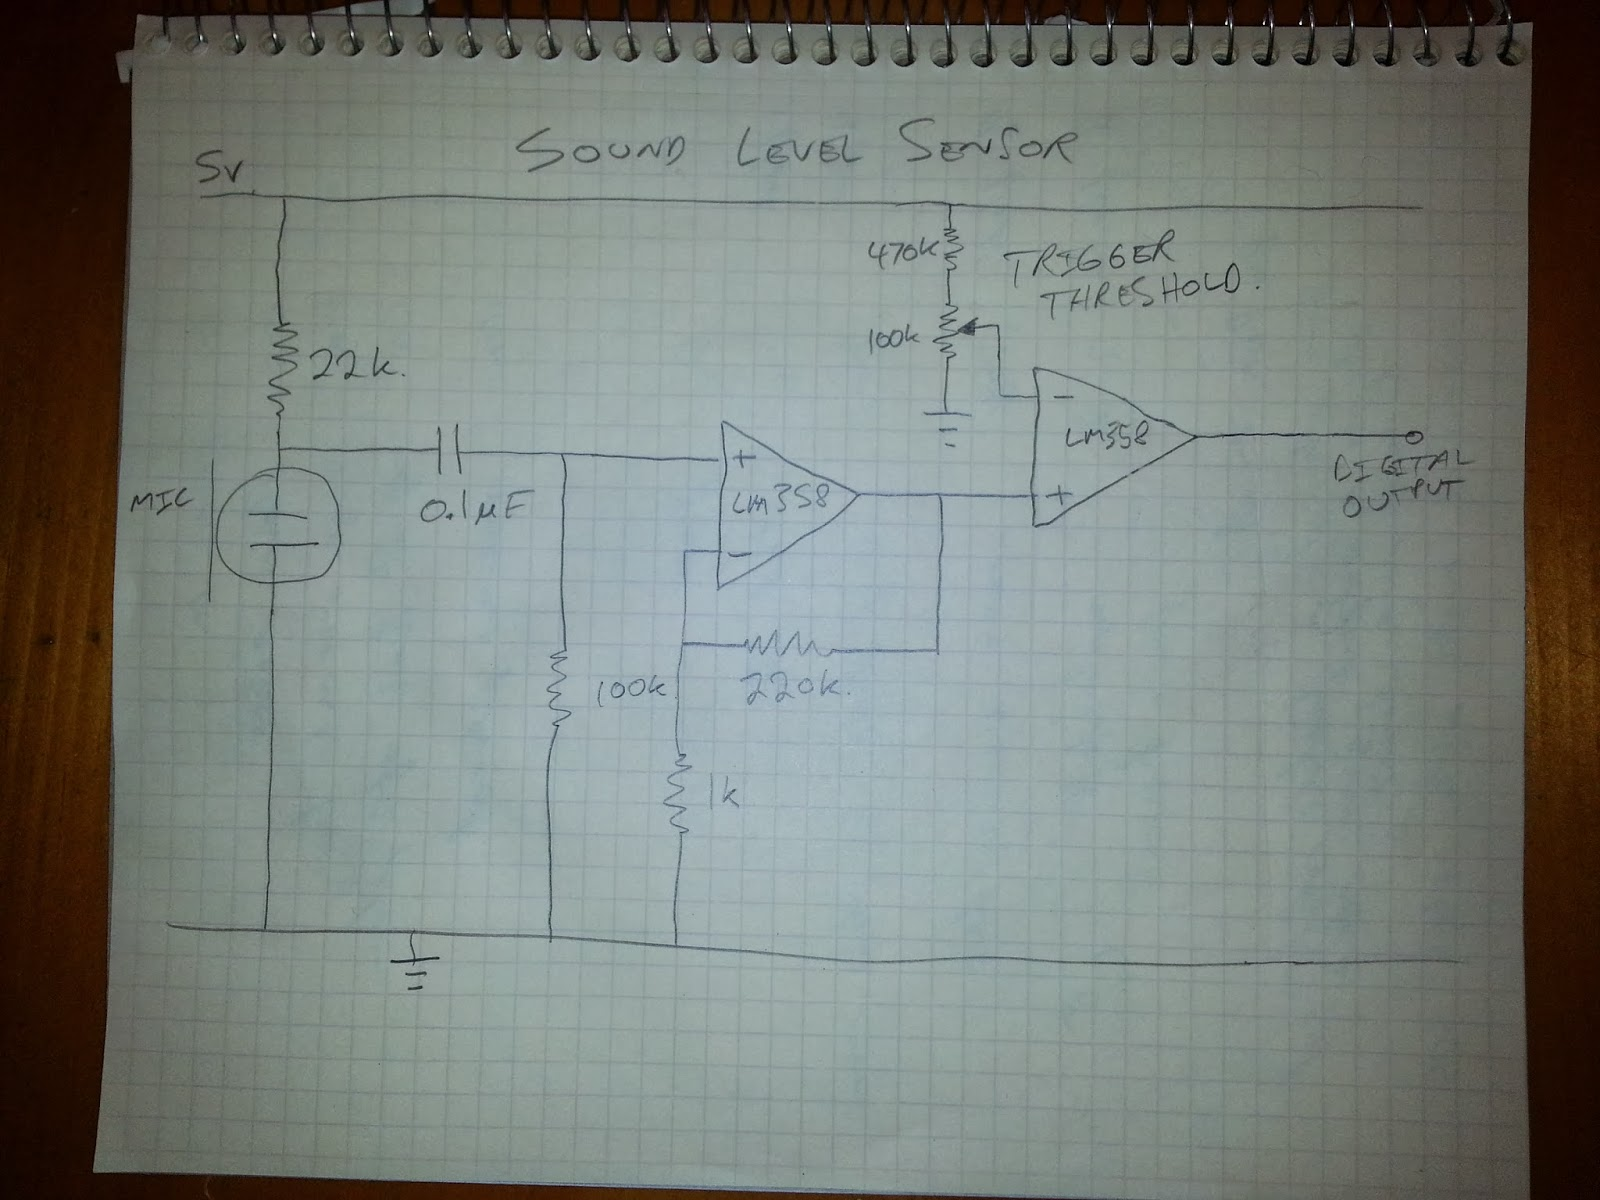 below is the schematic diagram of an audio input module we can below is the schematic diagram of an audio input module we can [ 1600 x 1200 Pixel ]